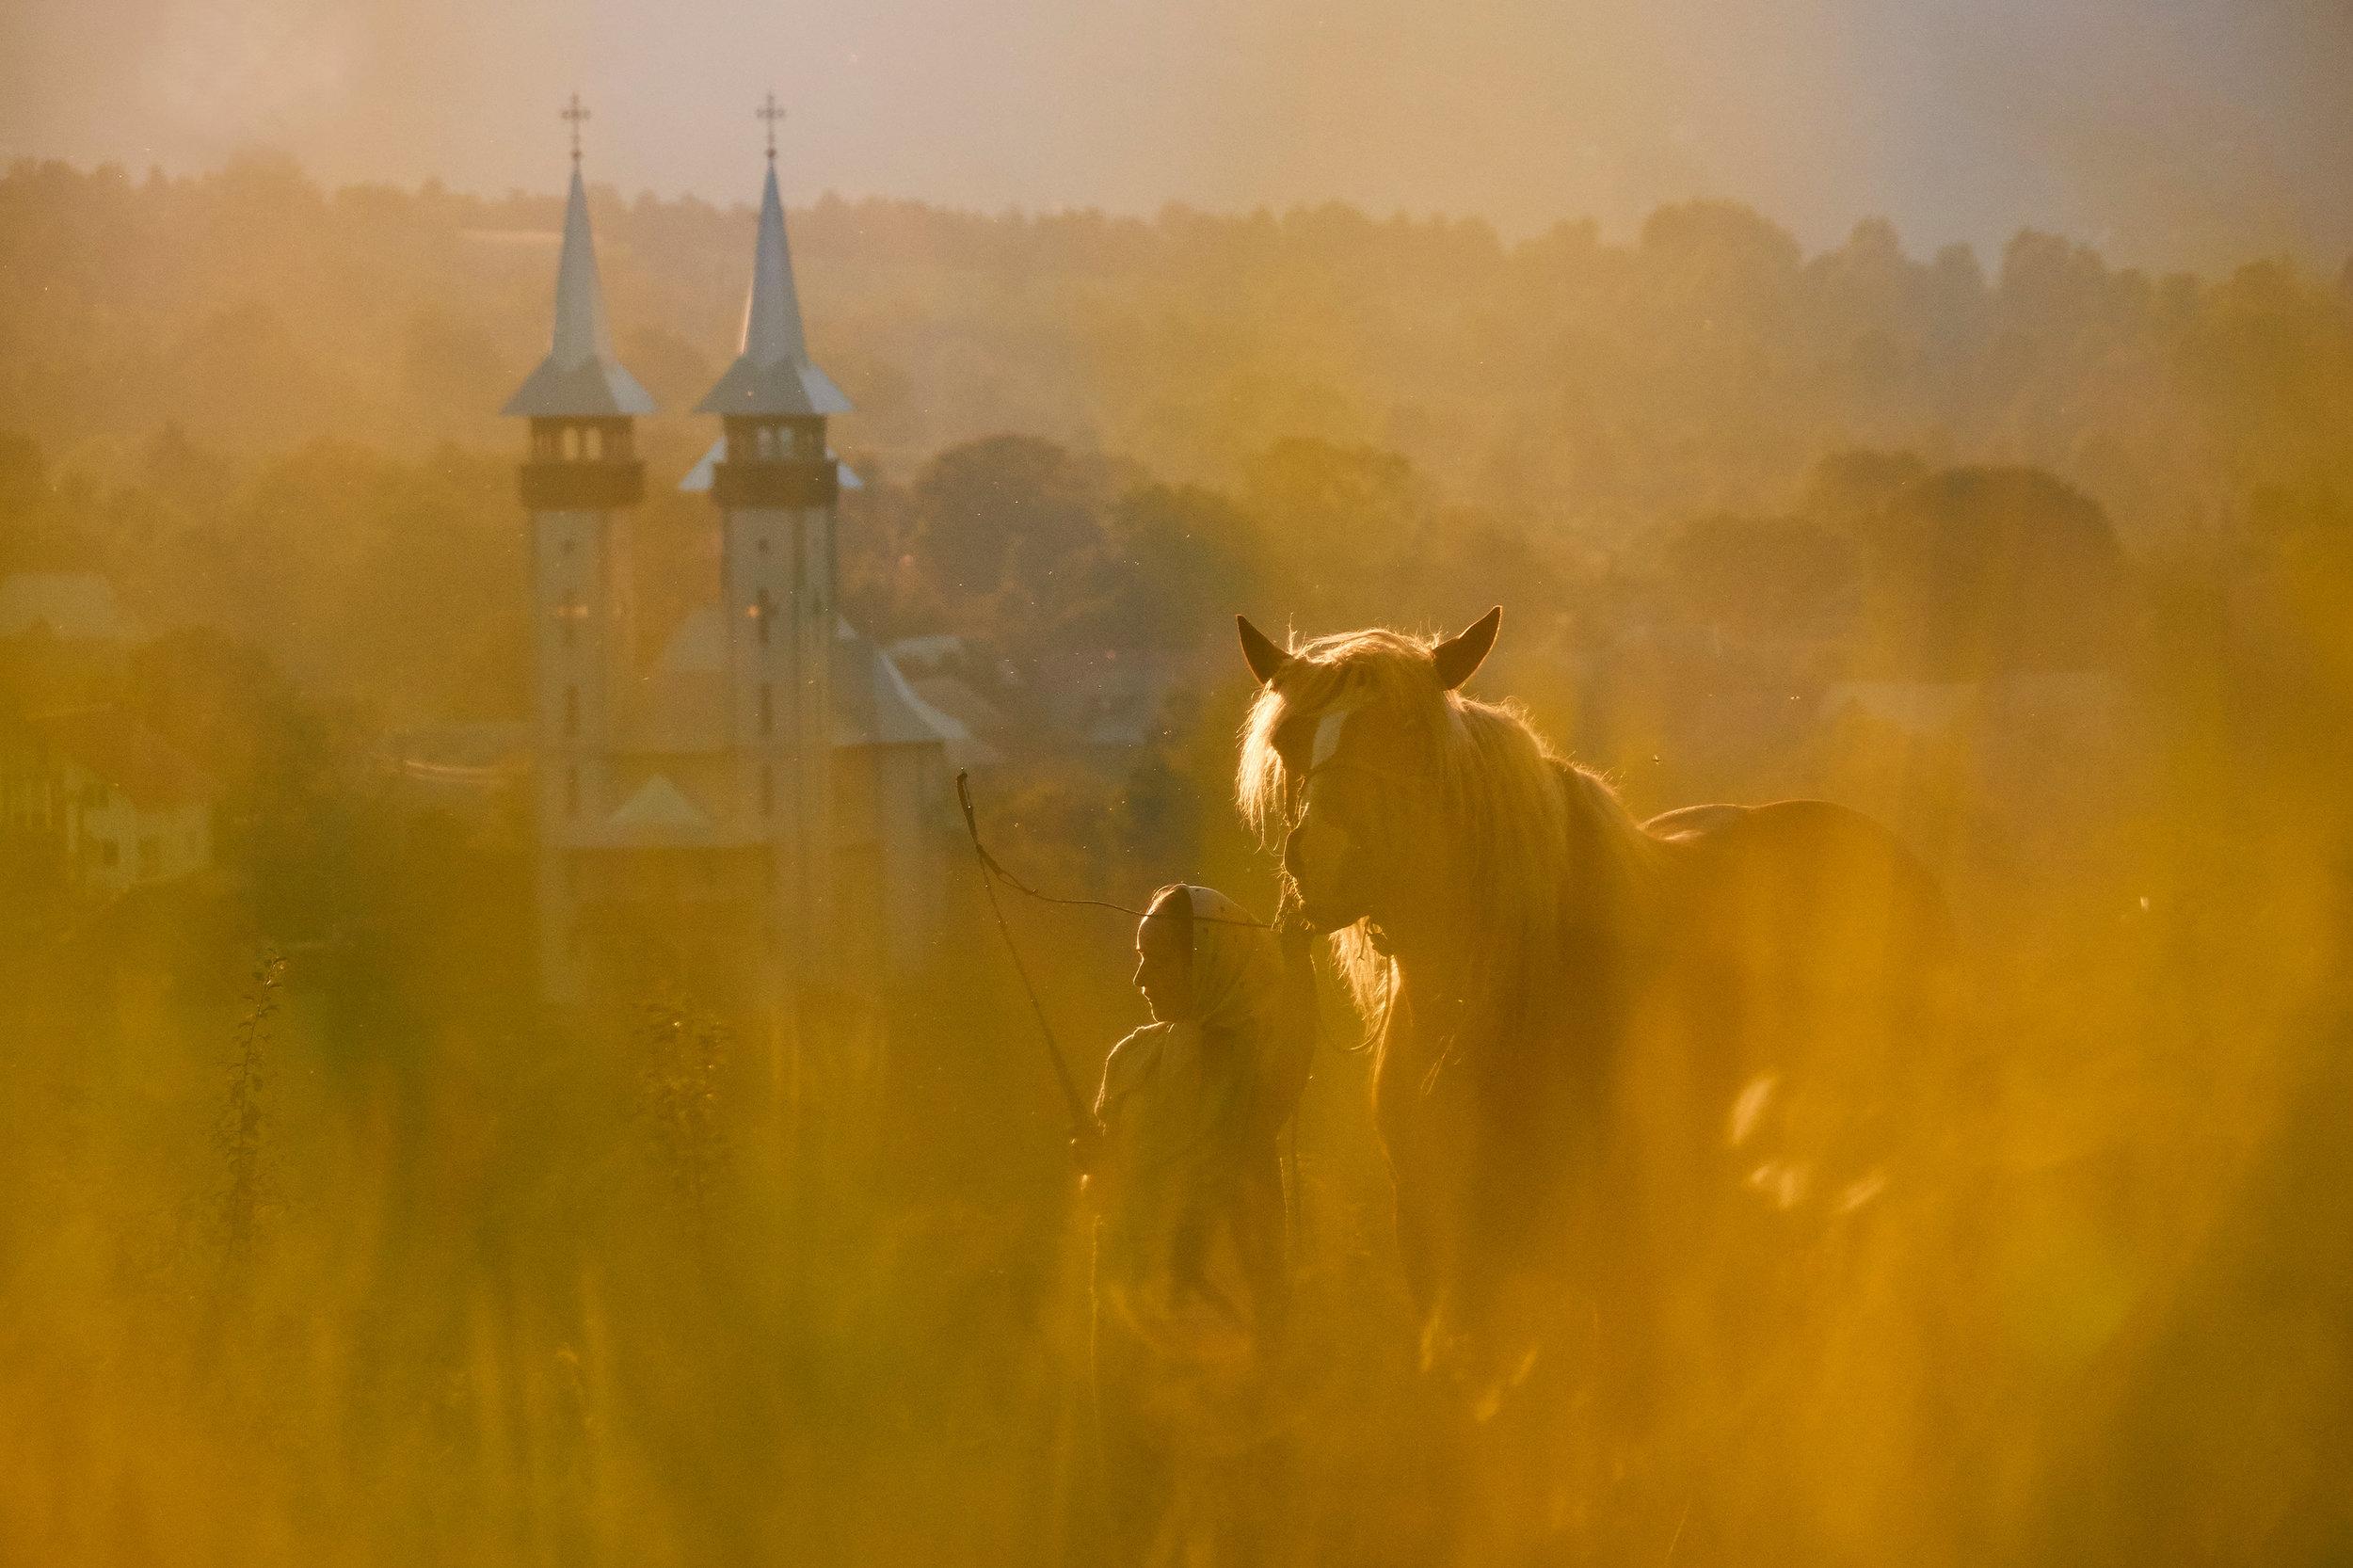 Maramures-Romania-girl-with-a-horse